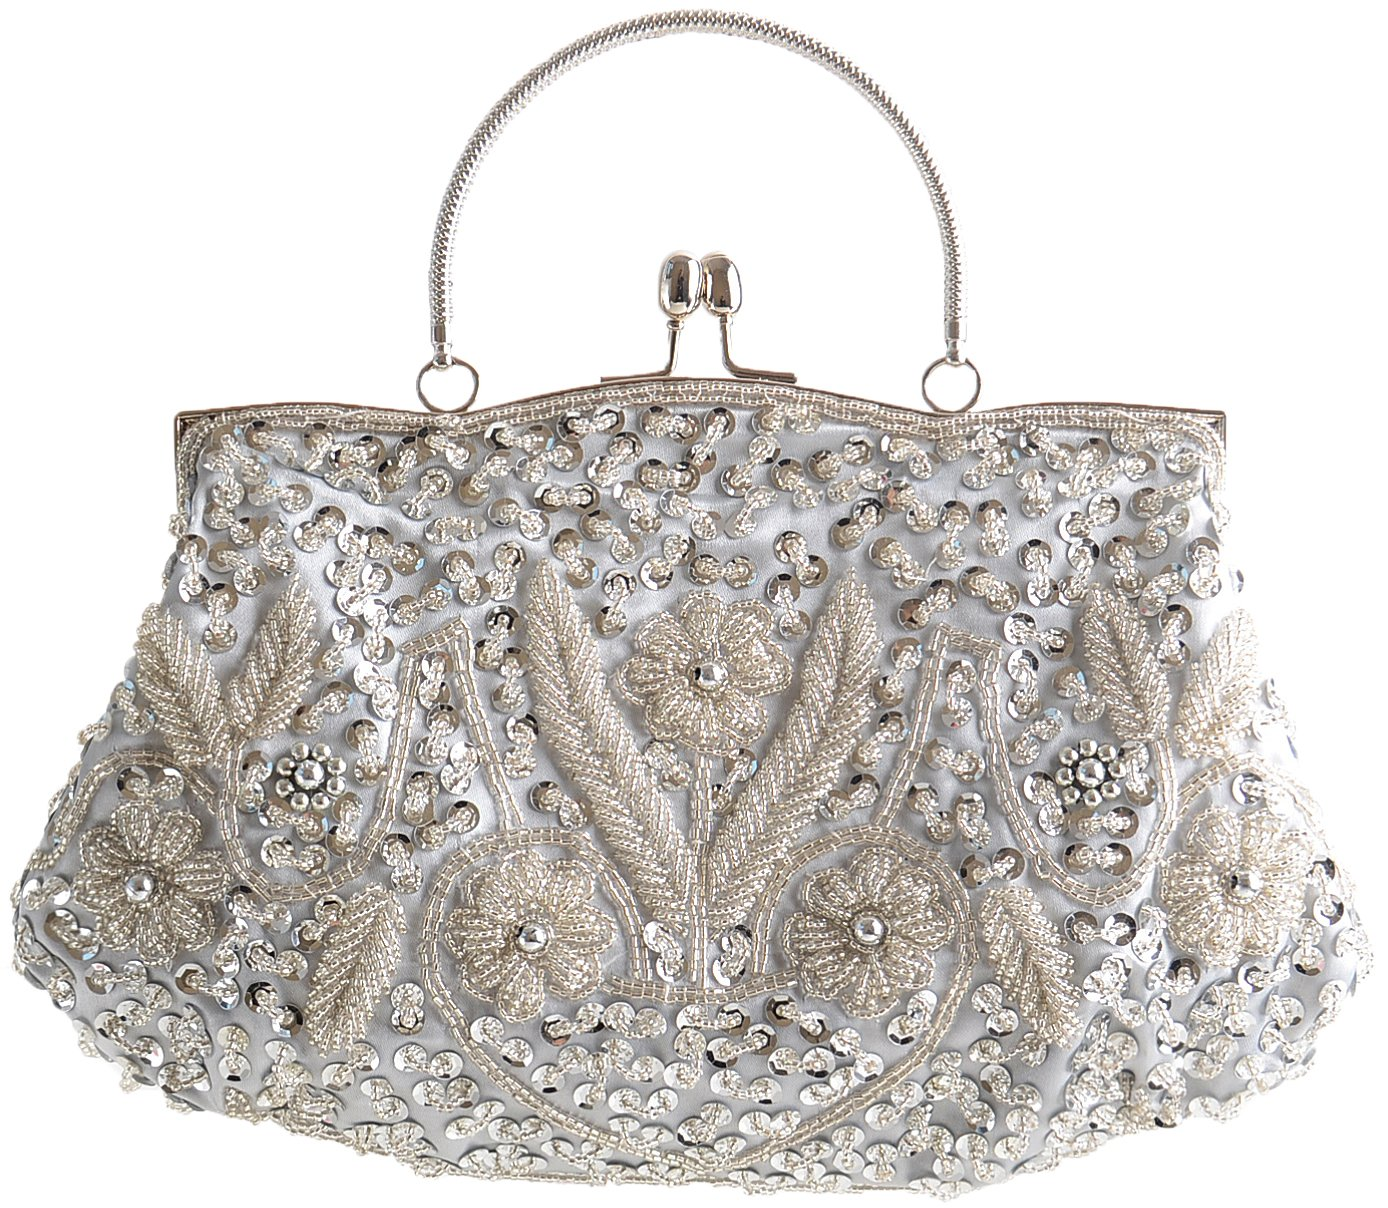 Womens Clutch 100% Handmade Sequins Wedding Bag-Pulama Bridal Handbag with Long Chain (Light Silver)